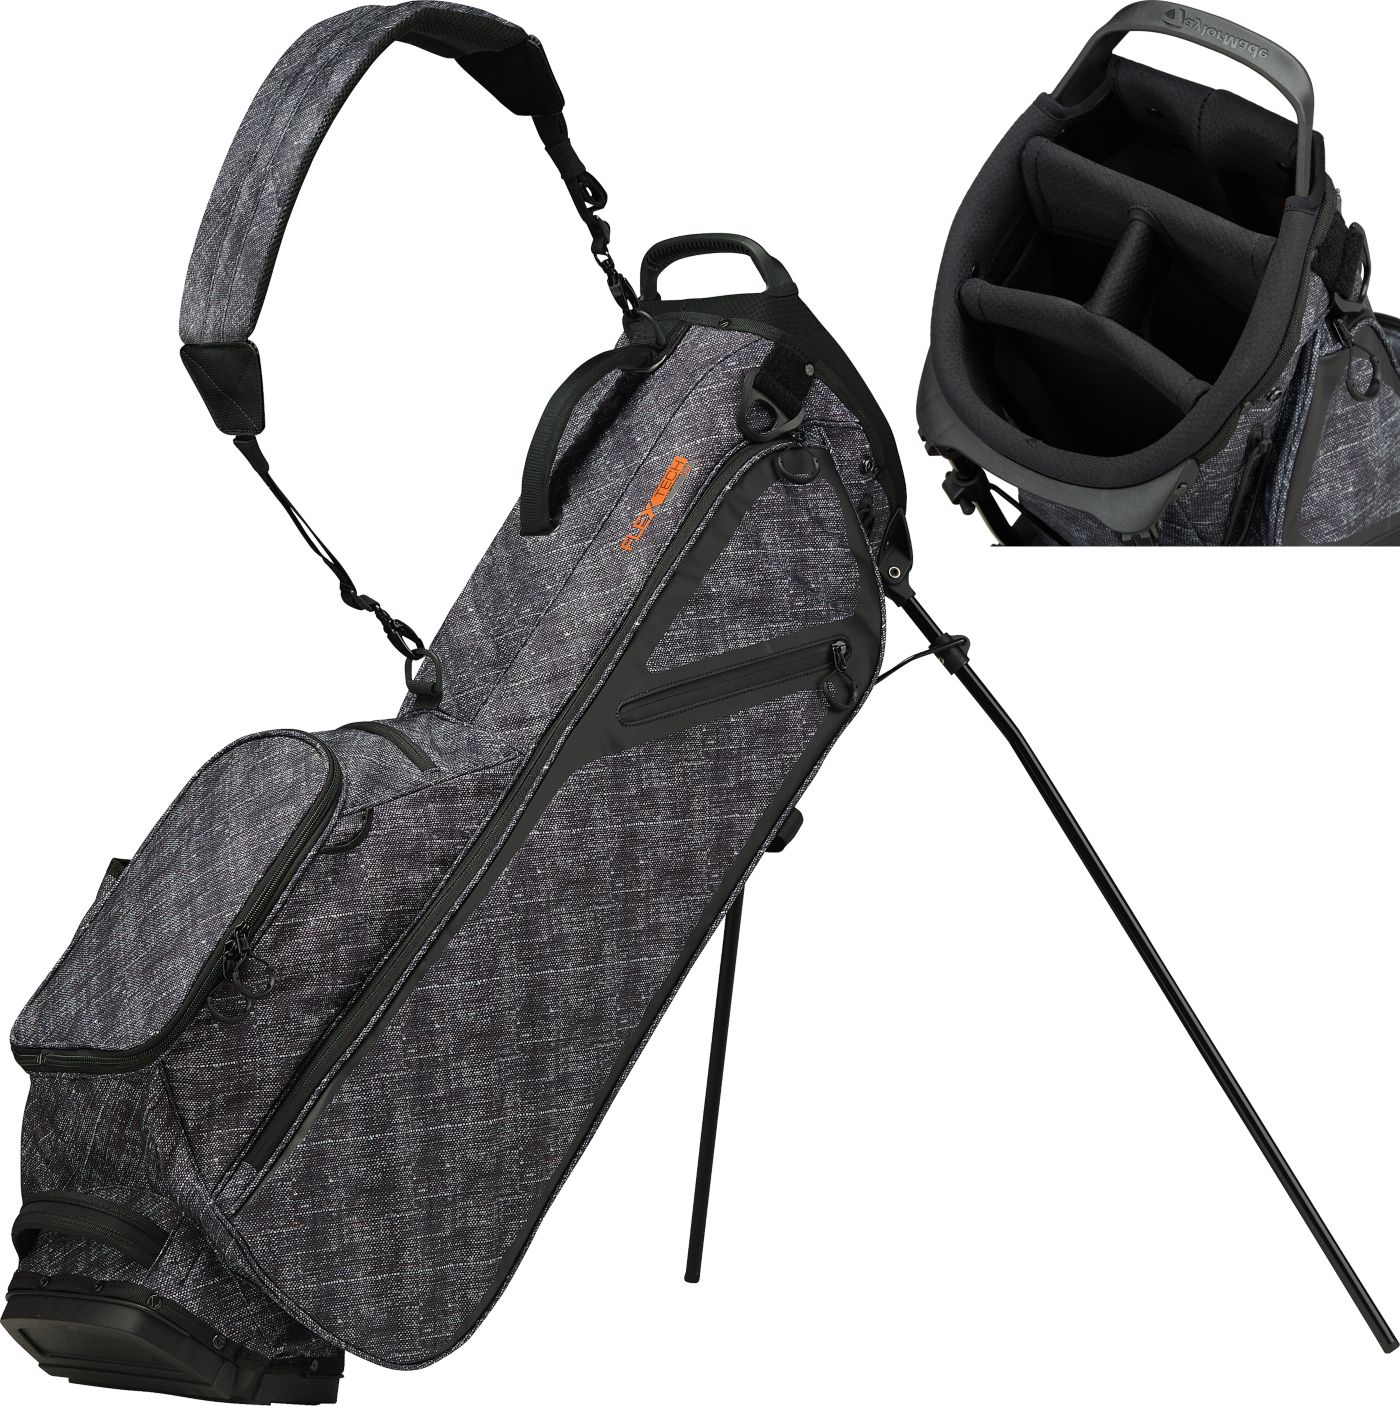 TaylorMade 2019 FlexTech Lite Lifestyle Single-Strap Stand Bag